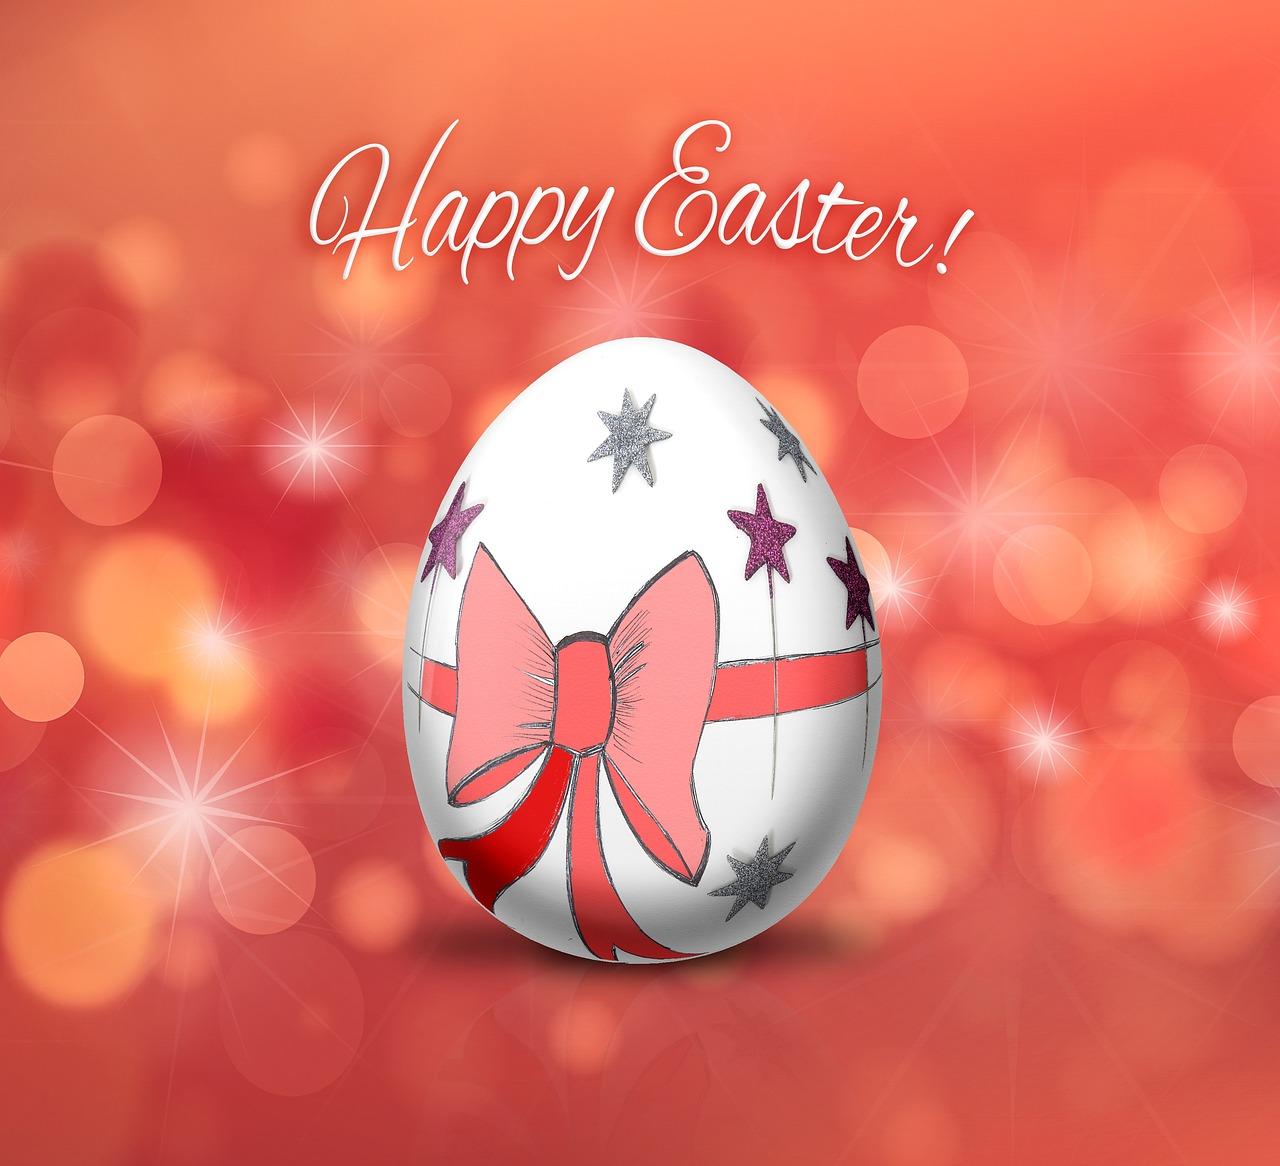 Eastereggsgreetingshappyeaster Egg Free Photo From Needpix